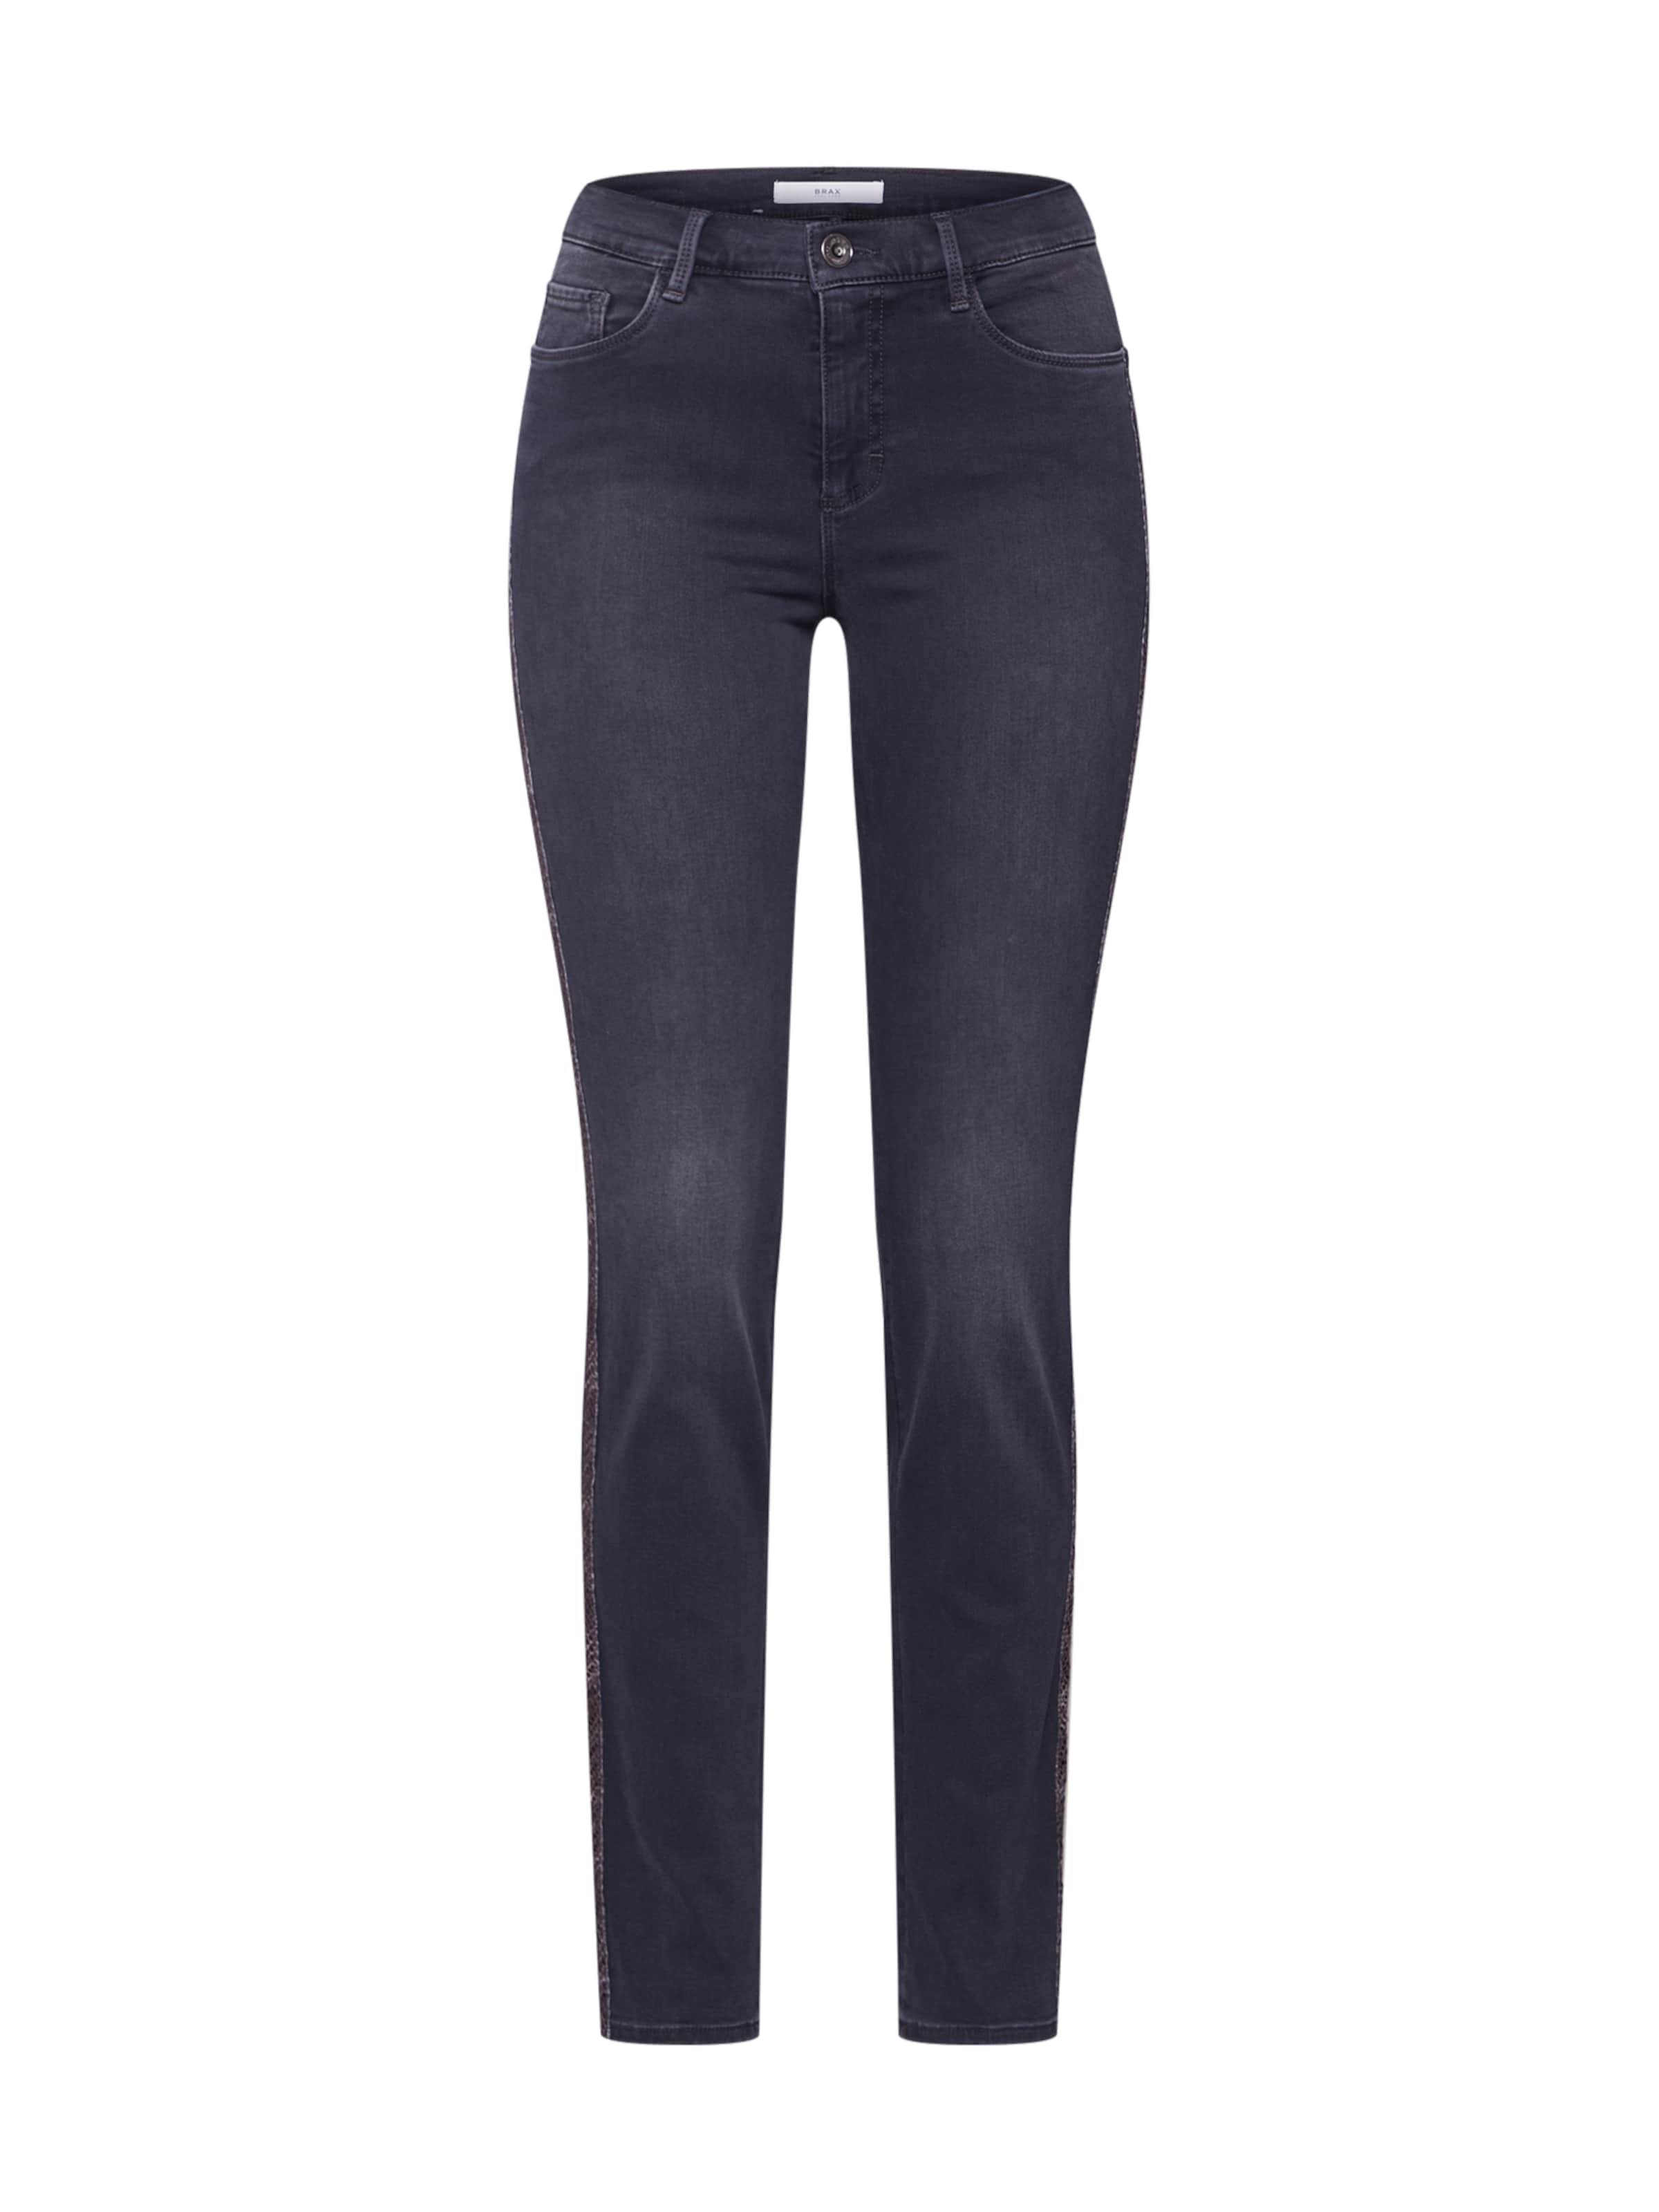 'shakira' Jeans Grey Brax Denim In WEID29eHY